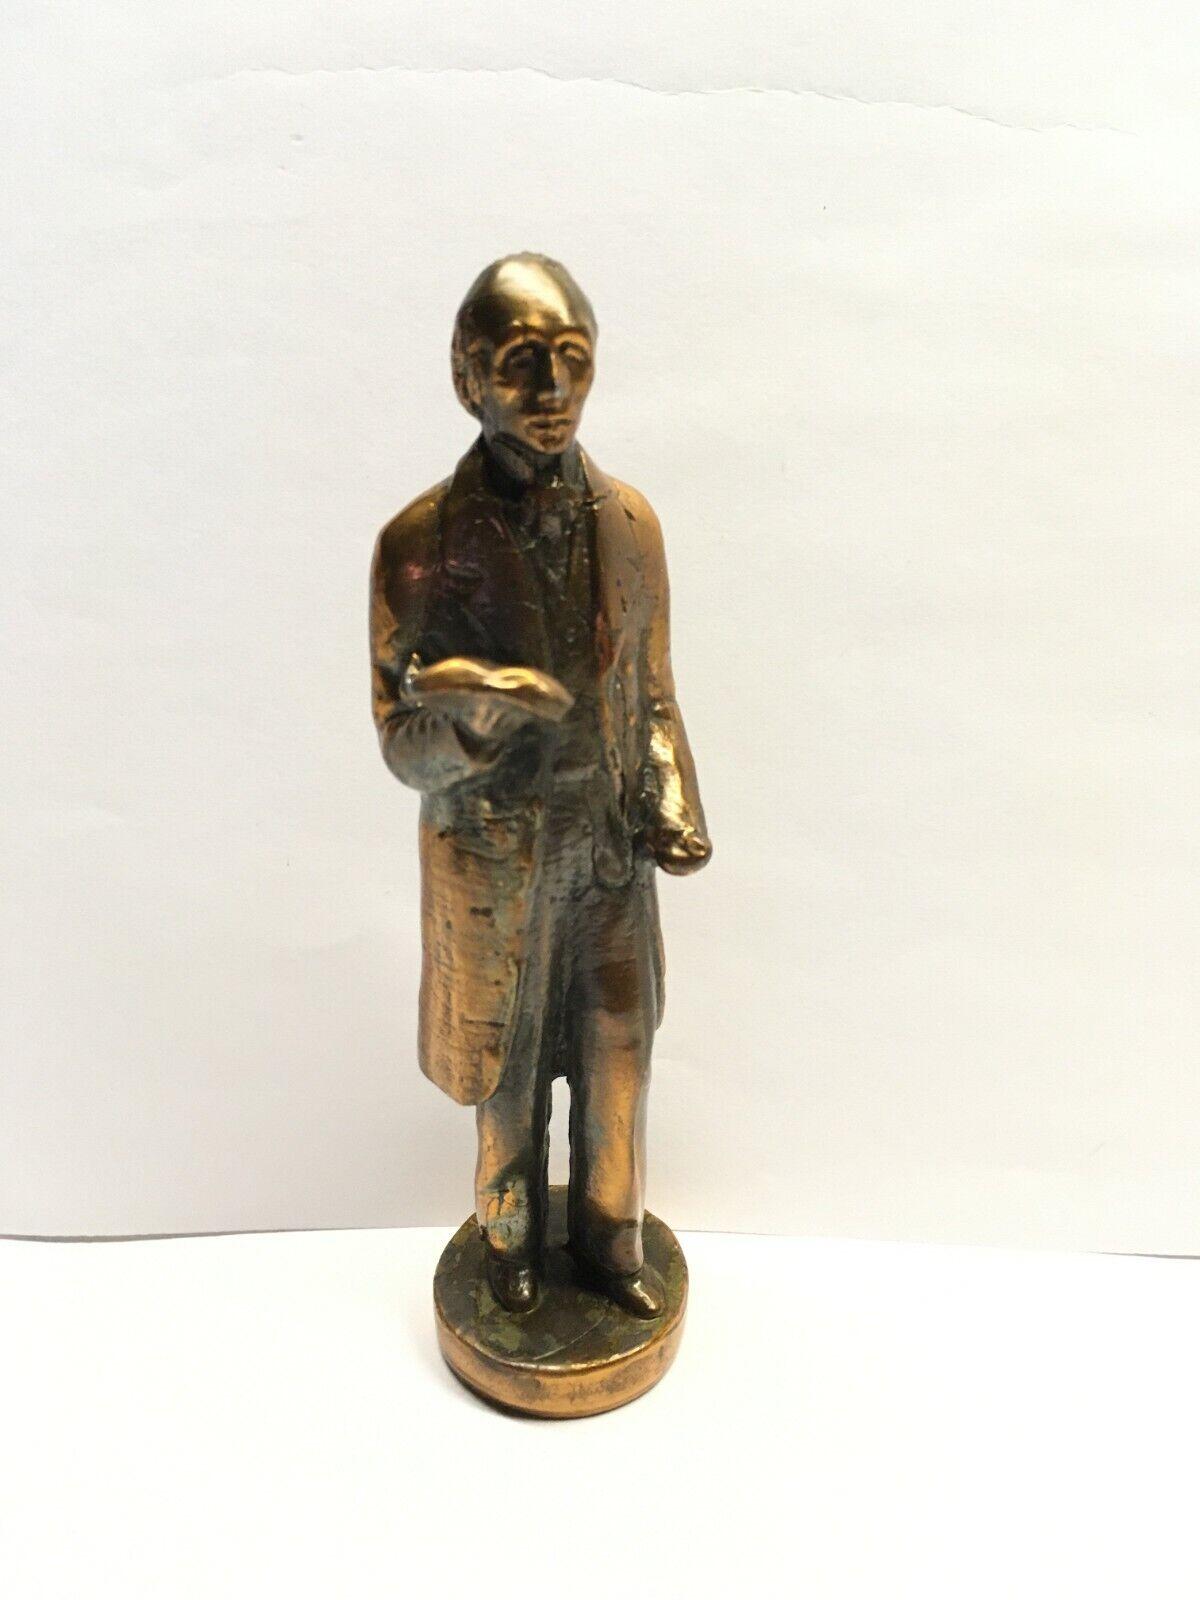 H.C. Andensen Copper Sculpture Statue 4-3/4 Denmark Labeled  - $30.00